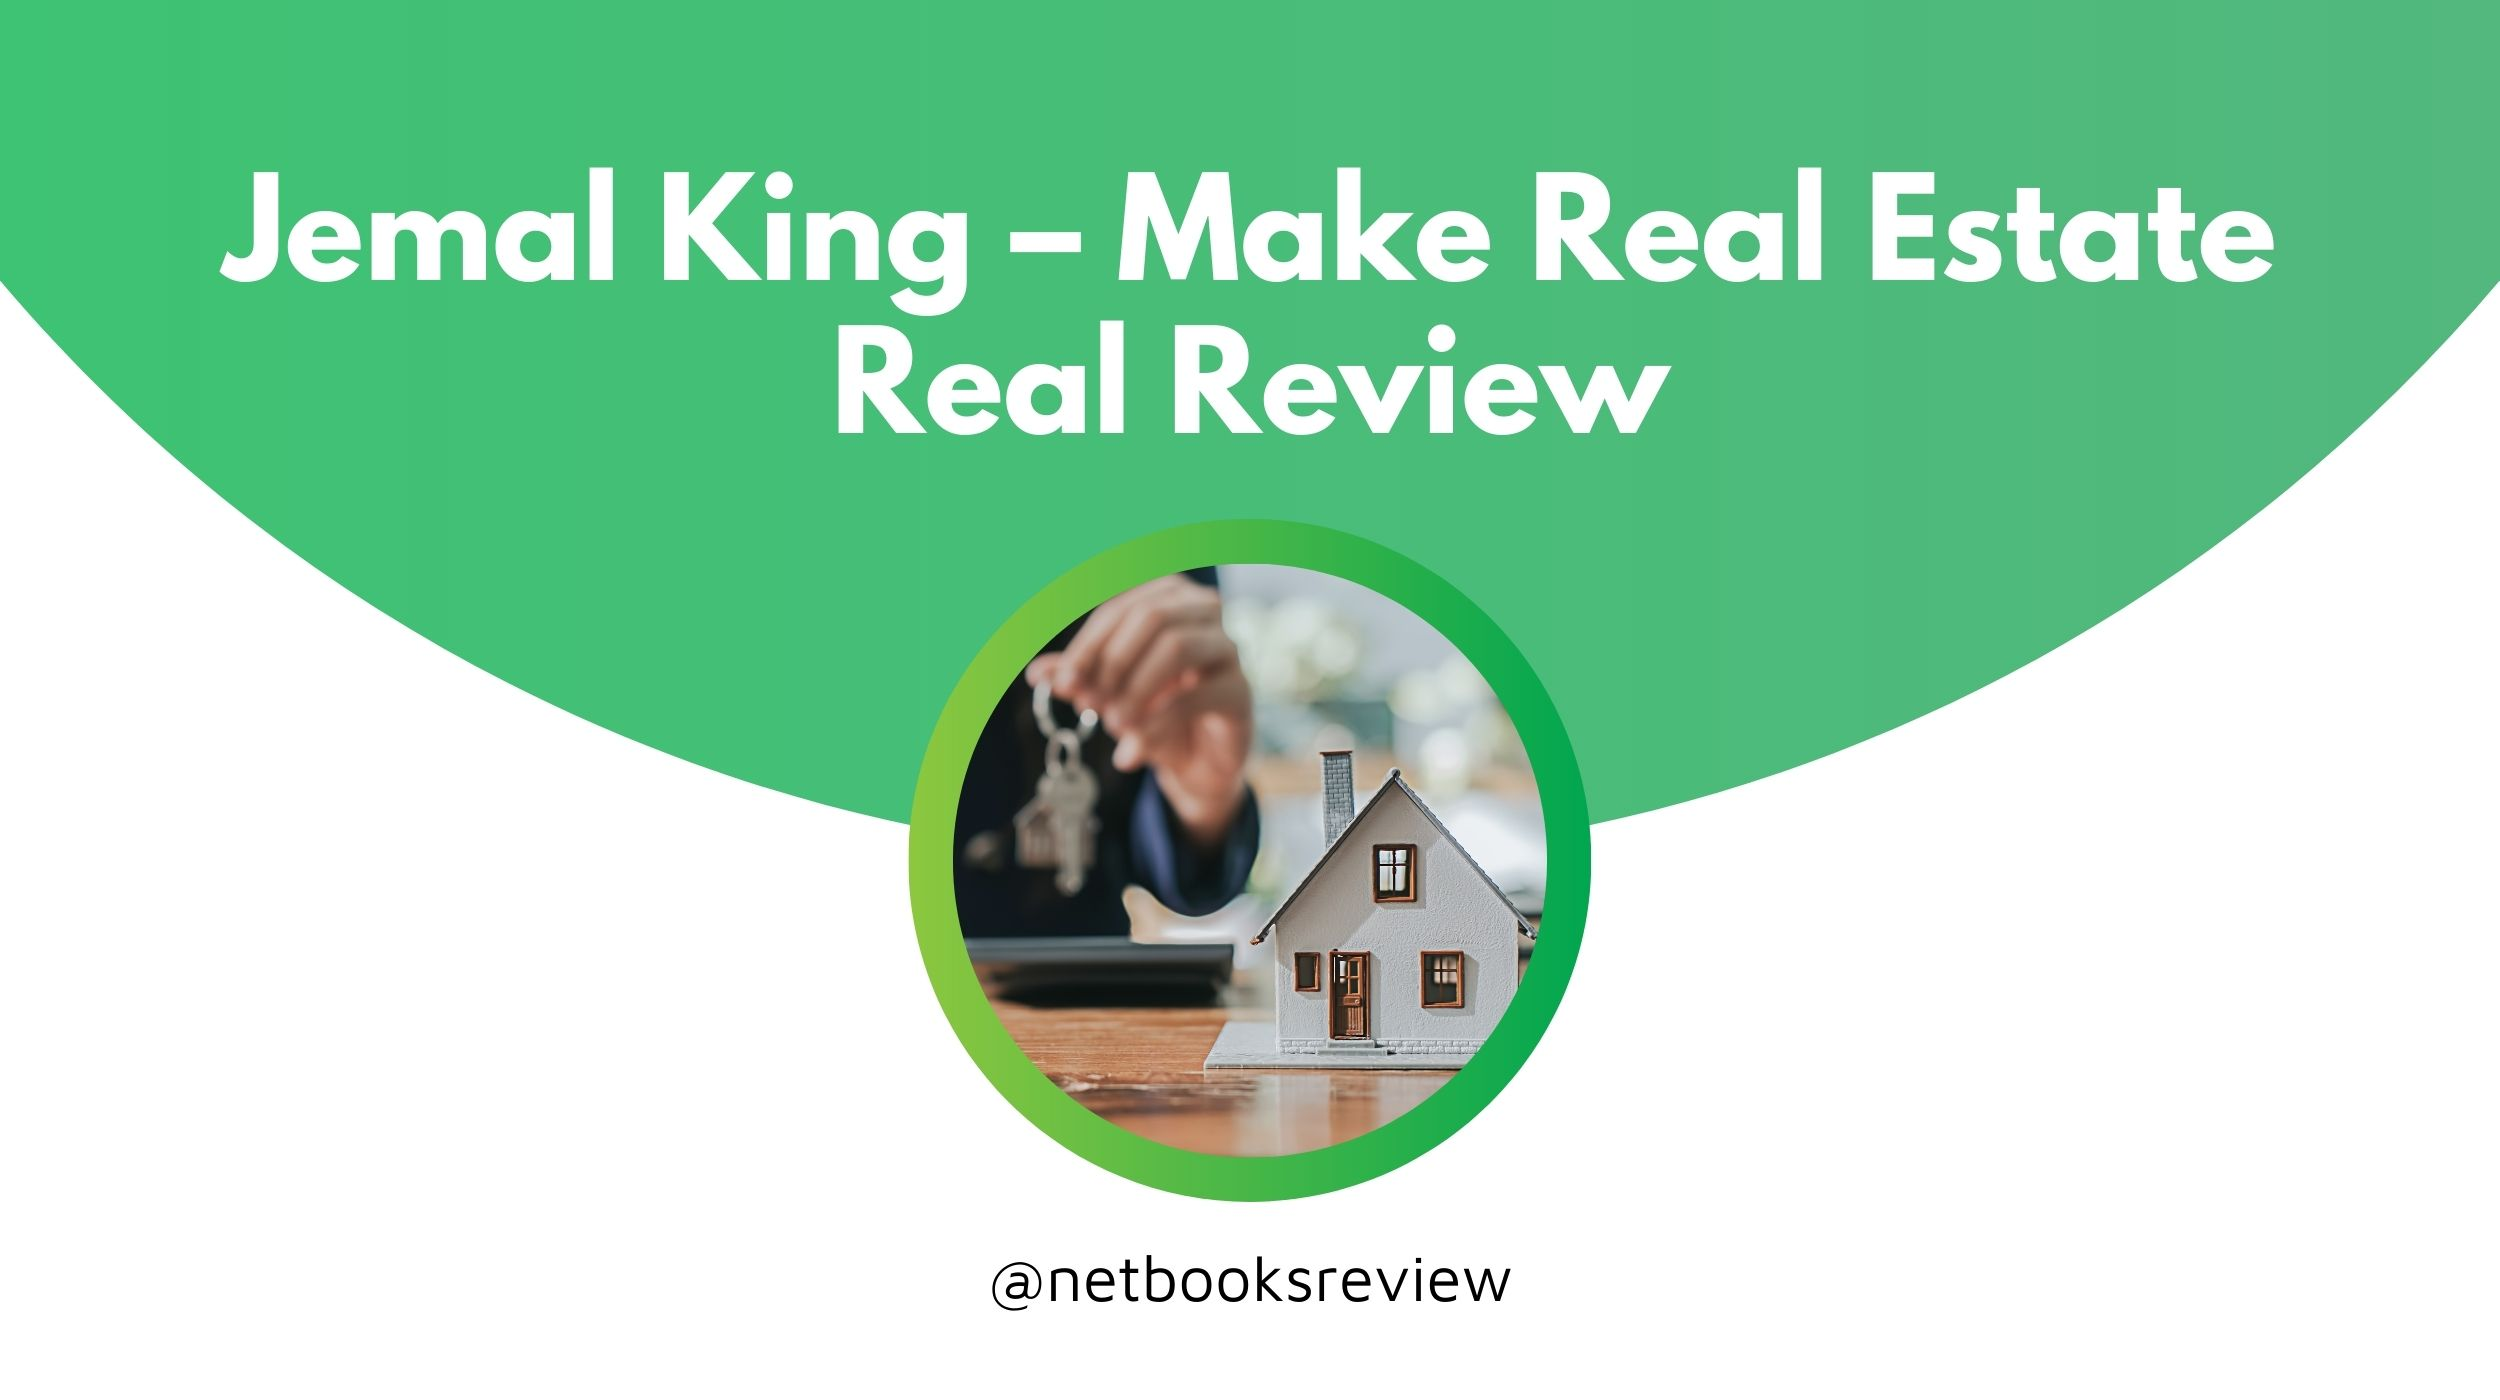 make real estate real review